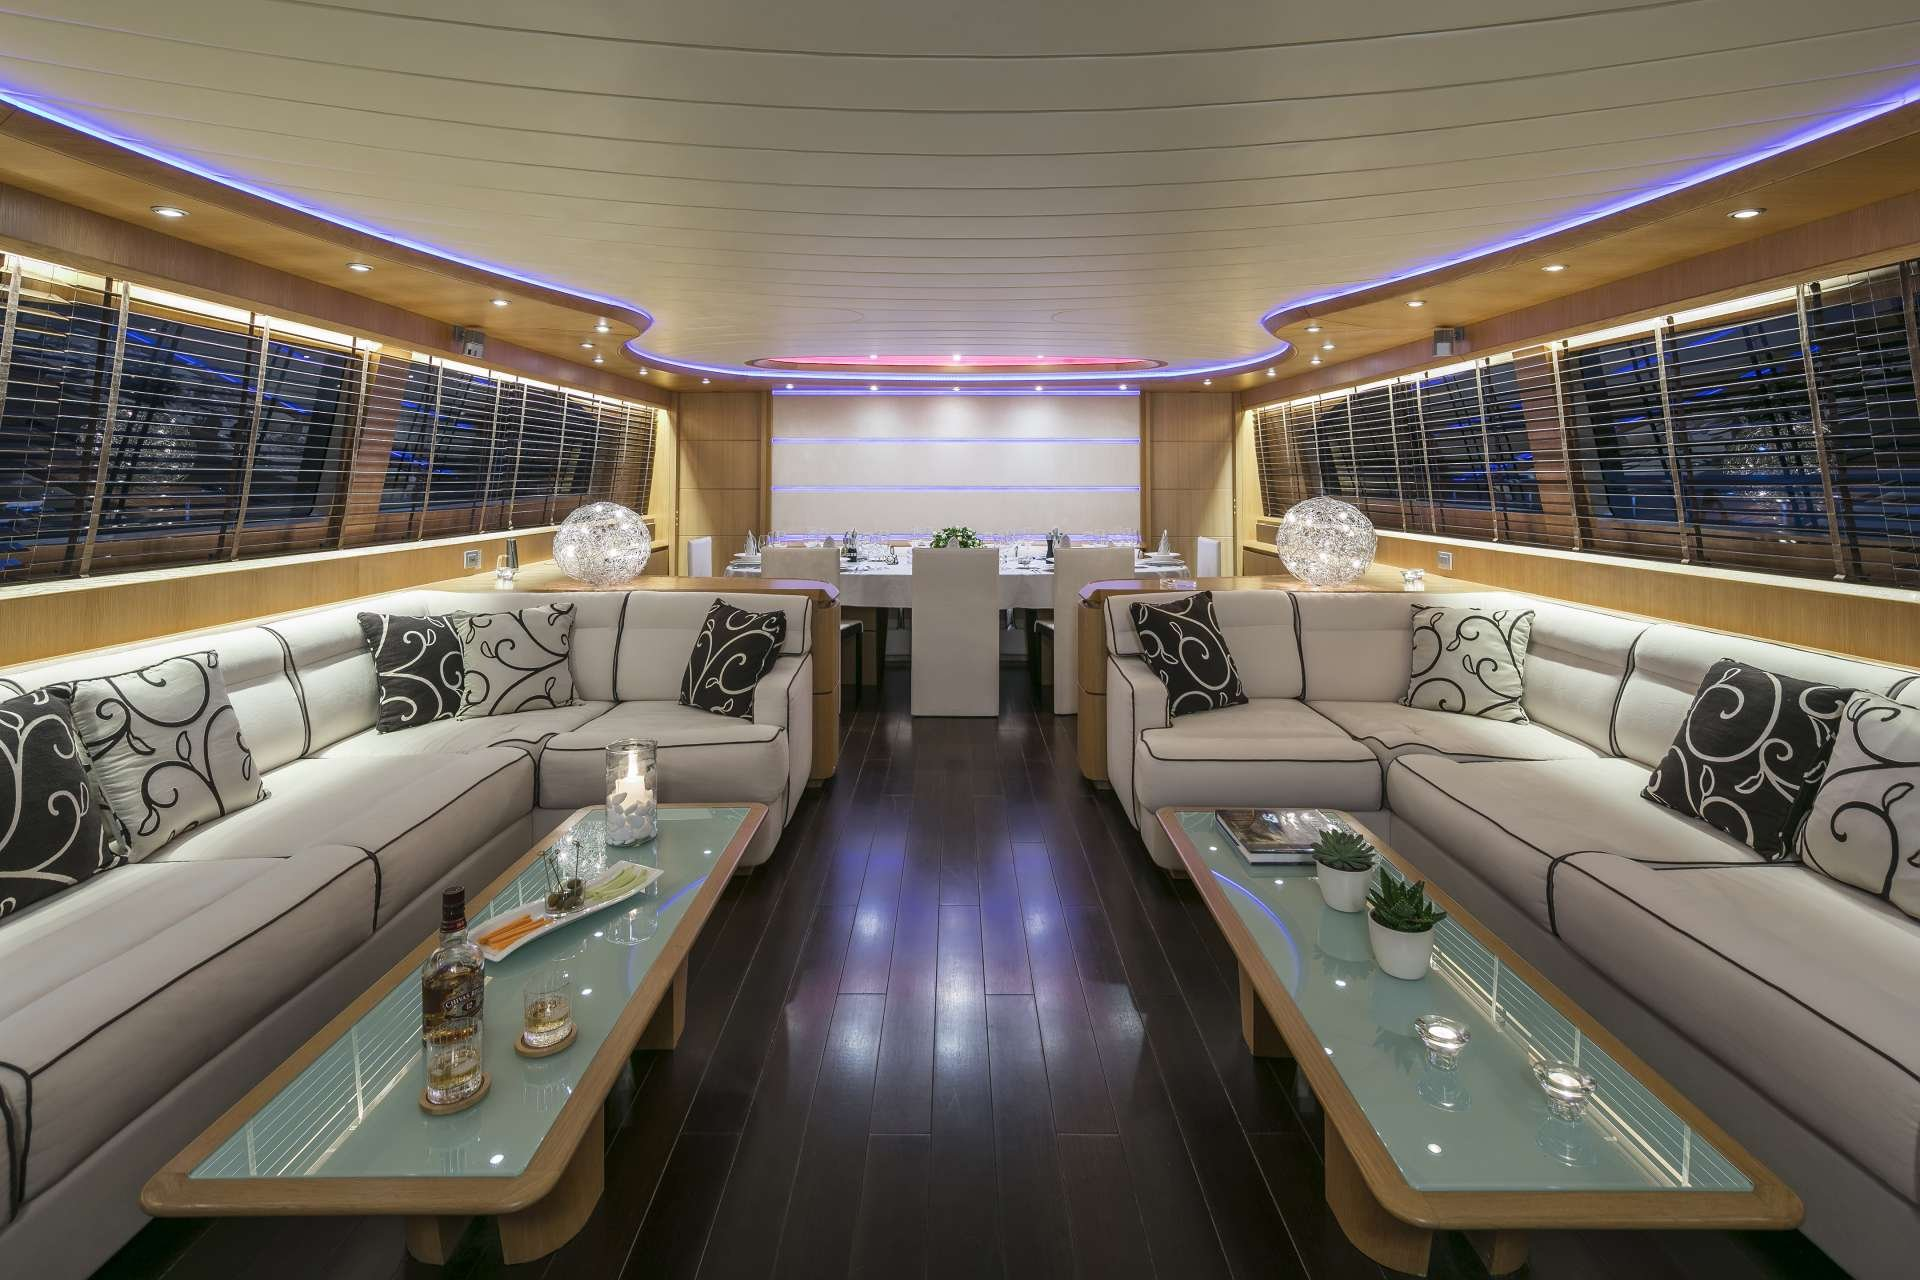 Motor Yacht 'PARIS A' Salon, 12 PAX, 6 Crew, 115.00 Ft, 35.06 Meters, Built 2009, Majora, Refit Year 2013